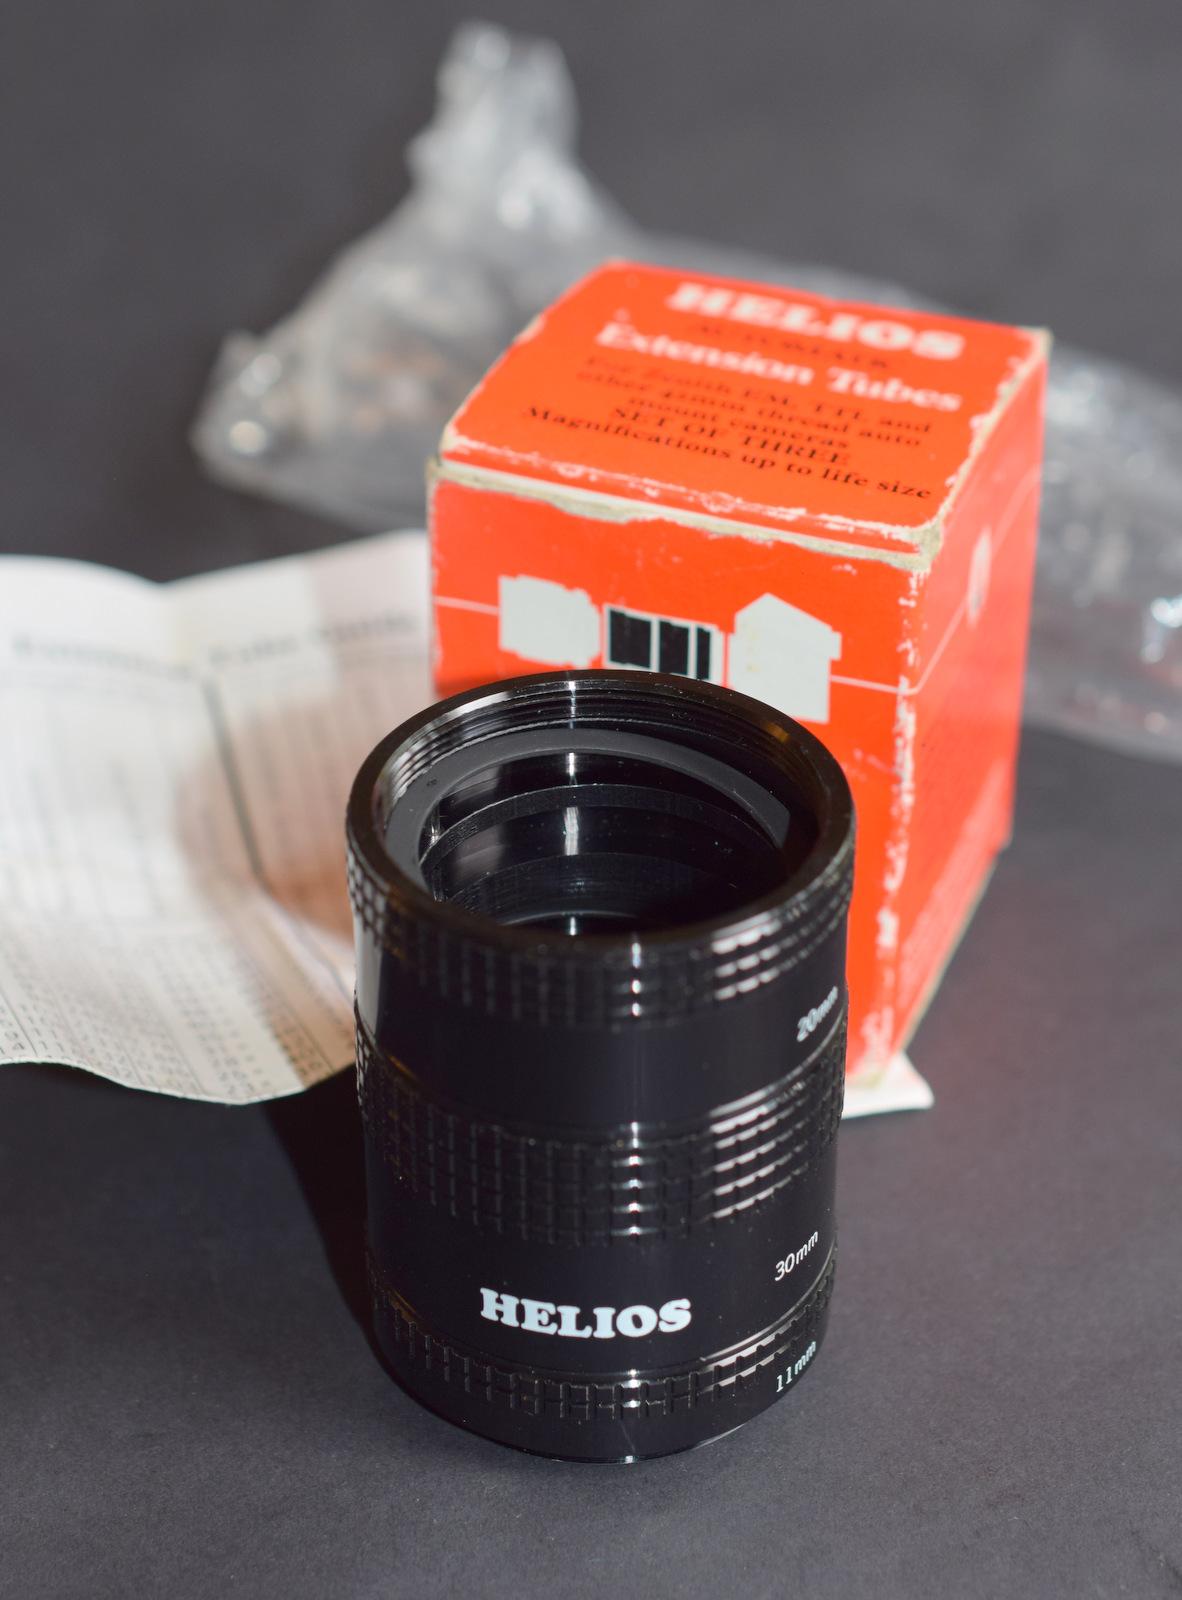 Lot 35 - Set of 3 automatic Helios M42 Screwmount Extension Tubes